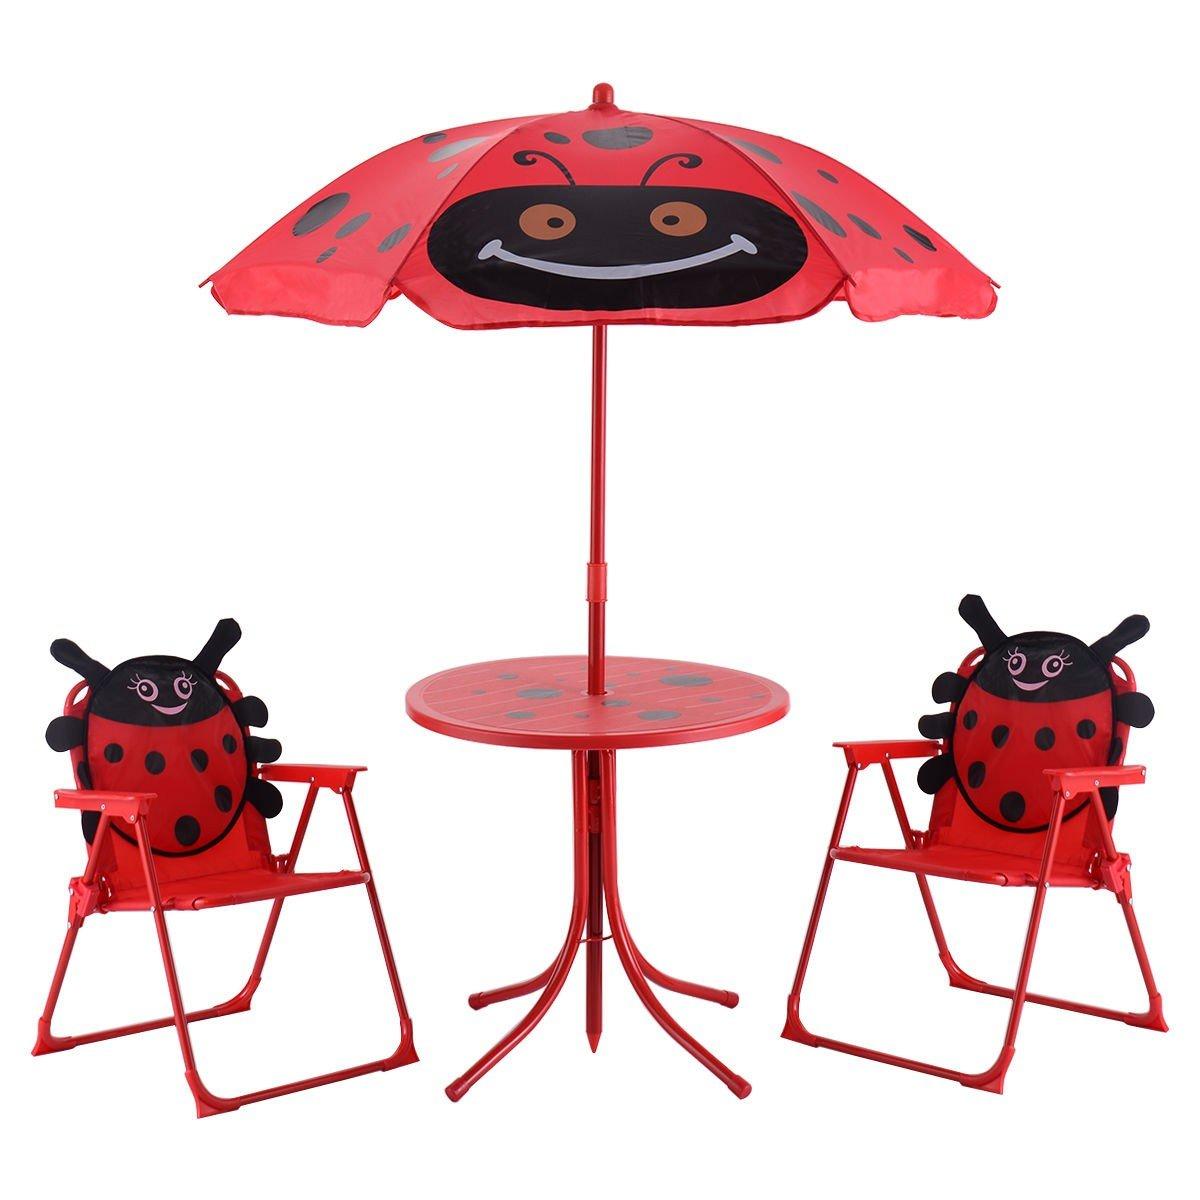 Kidsパティオ折りたたみ式テーブルと椅子セットBeetle with Umbrella – by Choice製品 B074FXJVD6